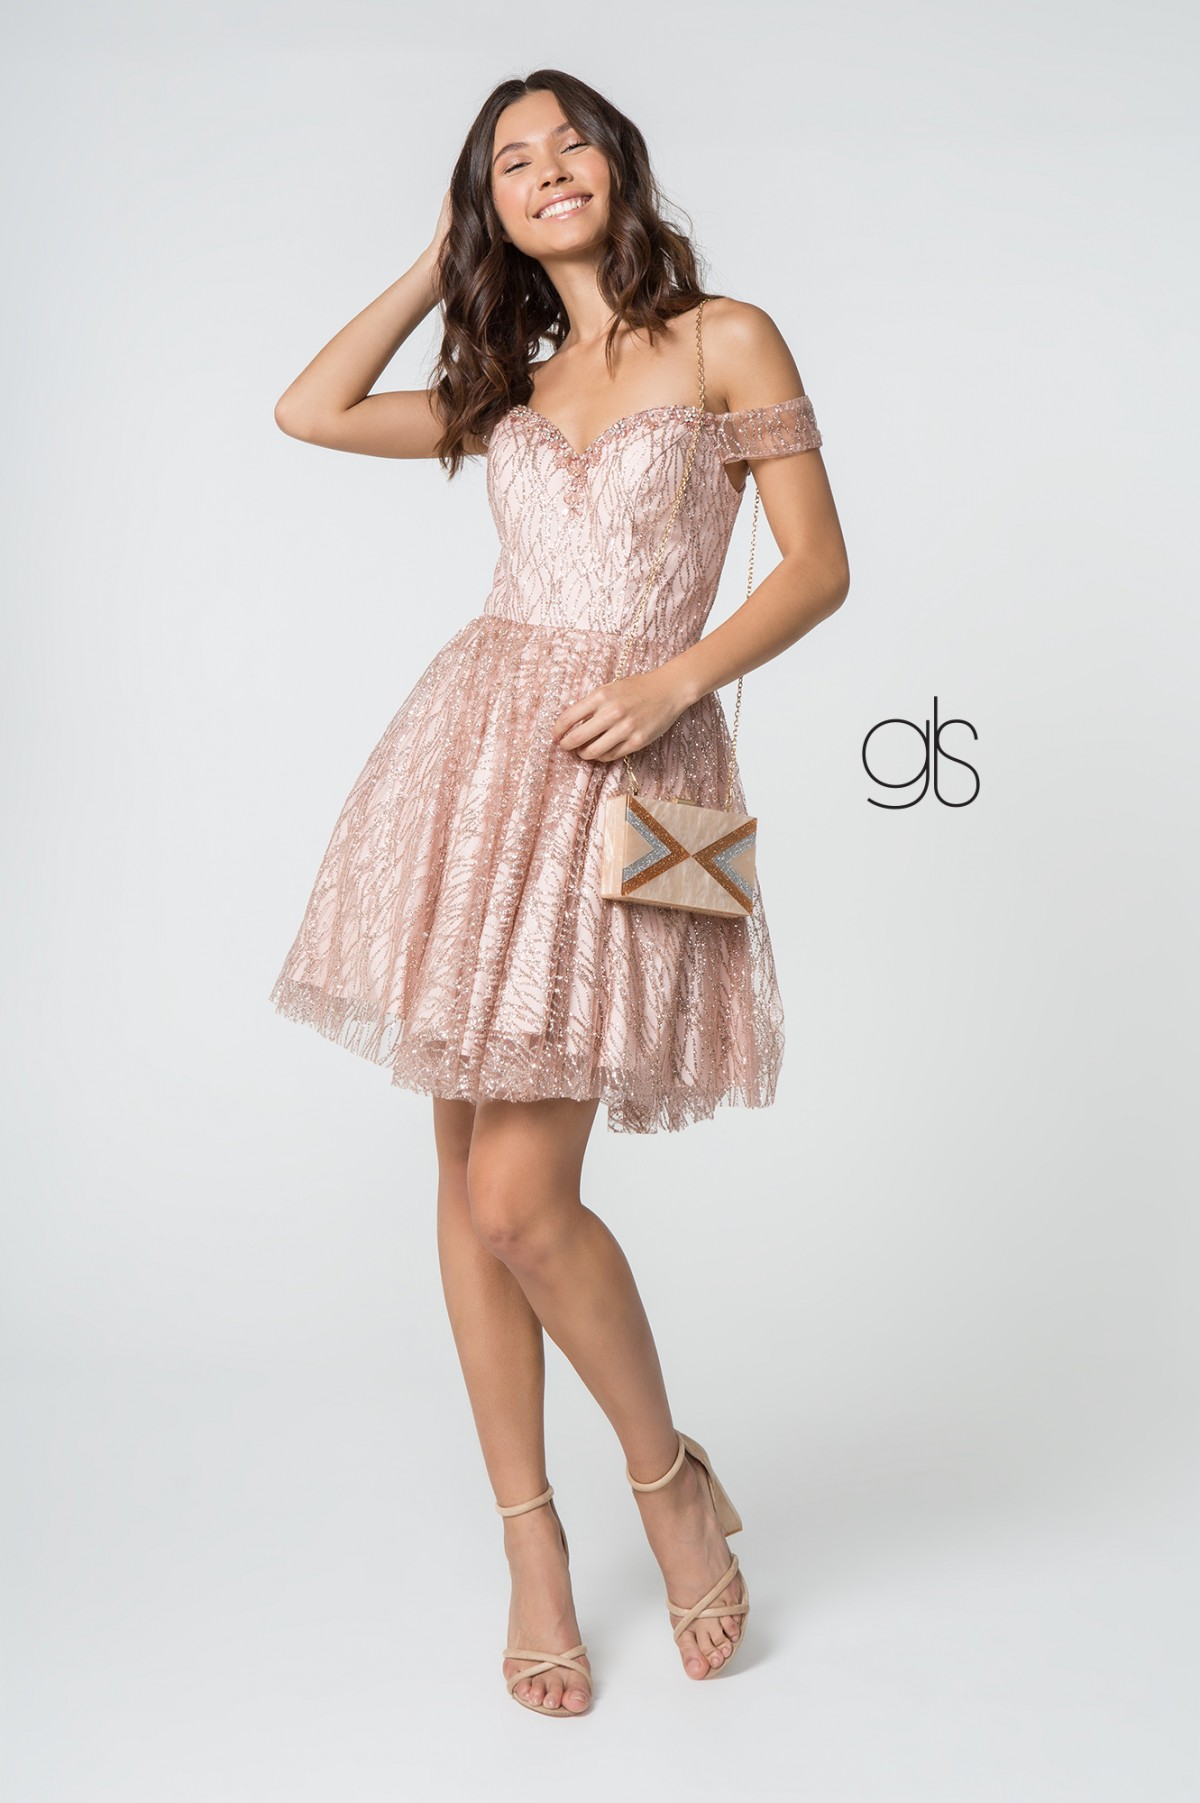 Beads Accented Sweetheart Neck Glitter Mesh Short Dress in Rose Gold